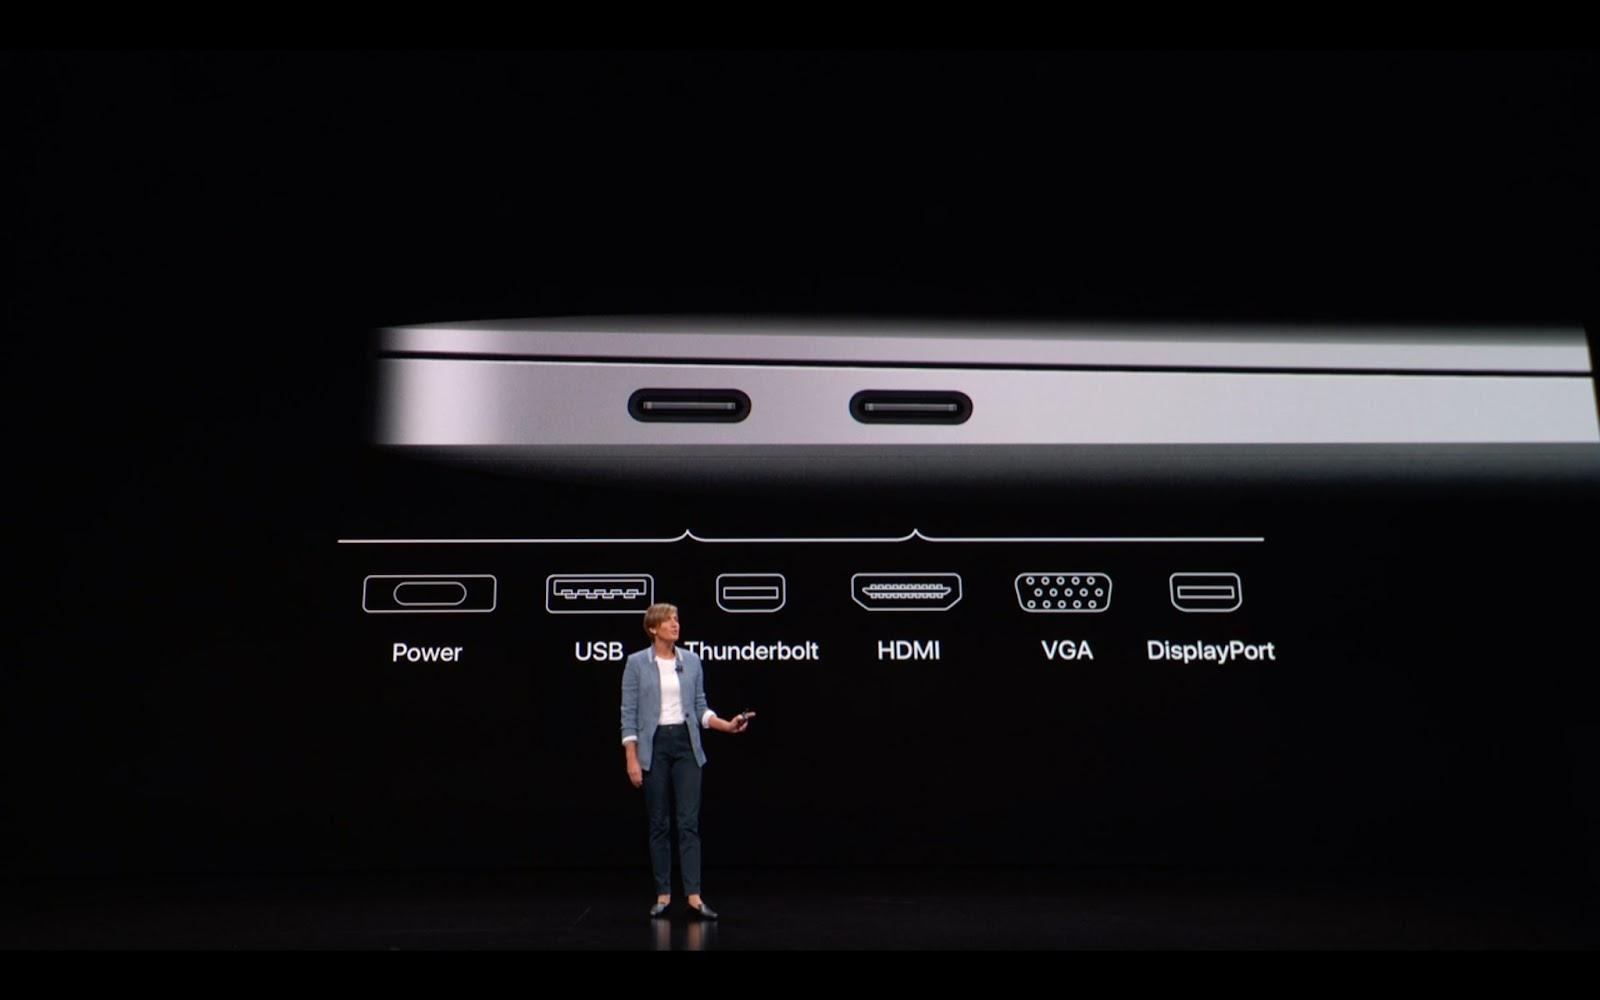 Đang tải Macbook_Air_2018_tinhte-15.jpg…